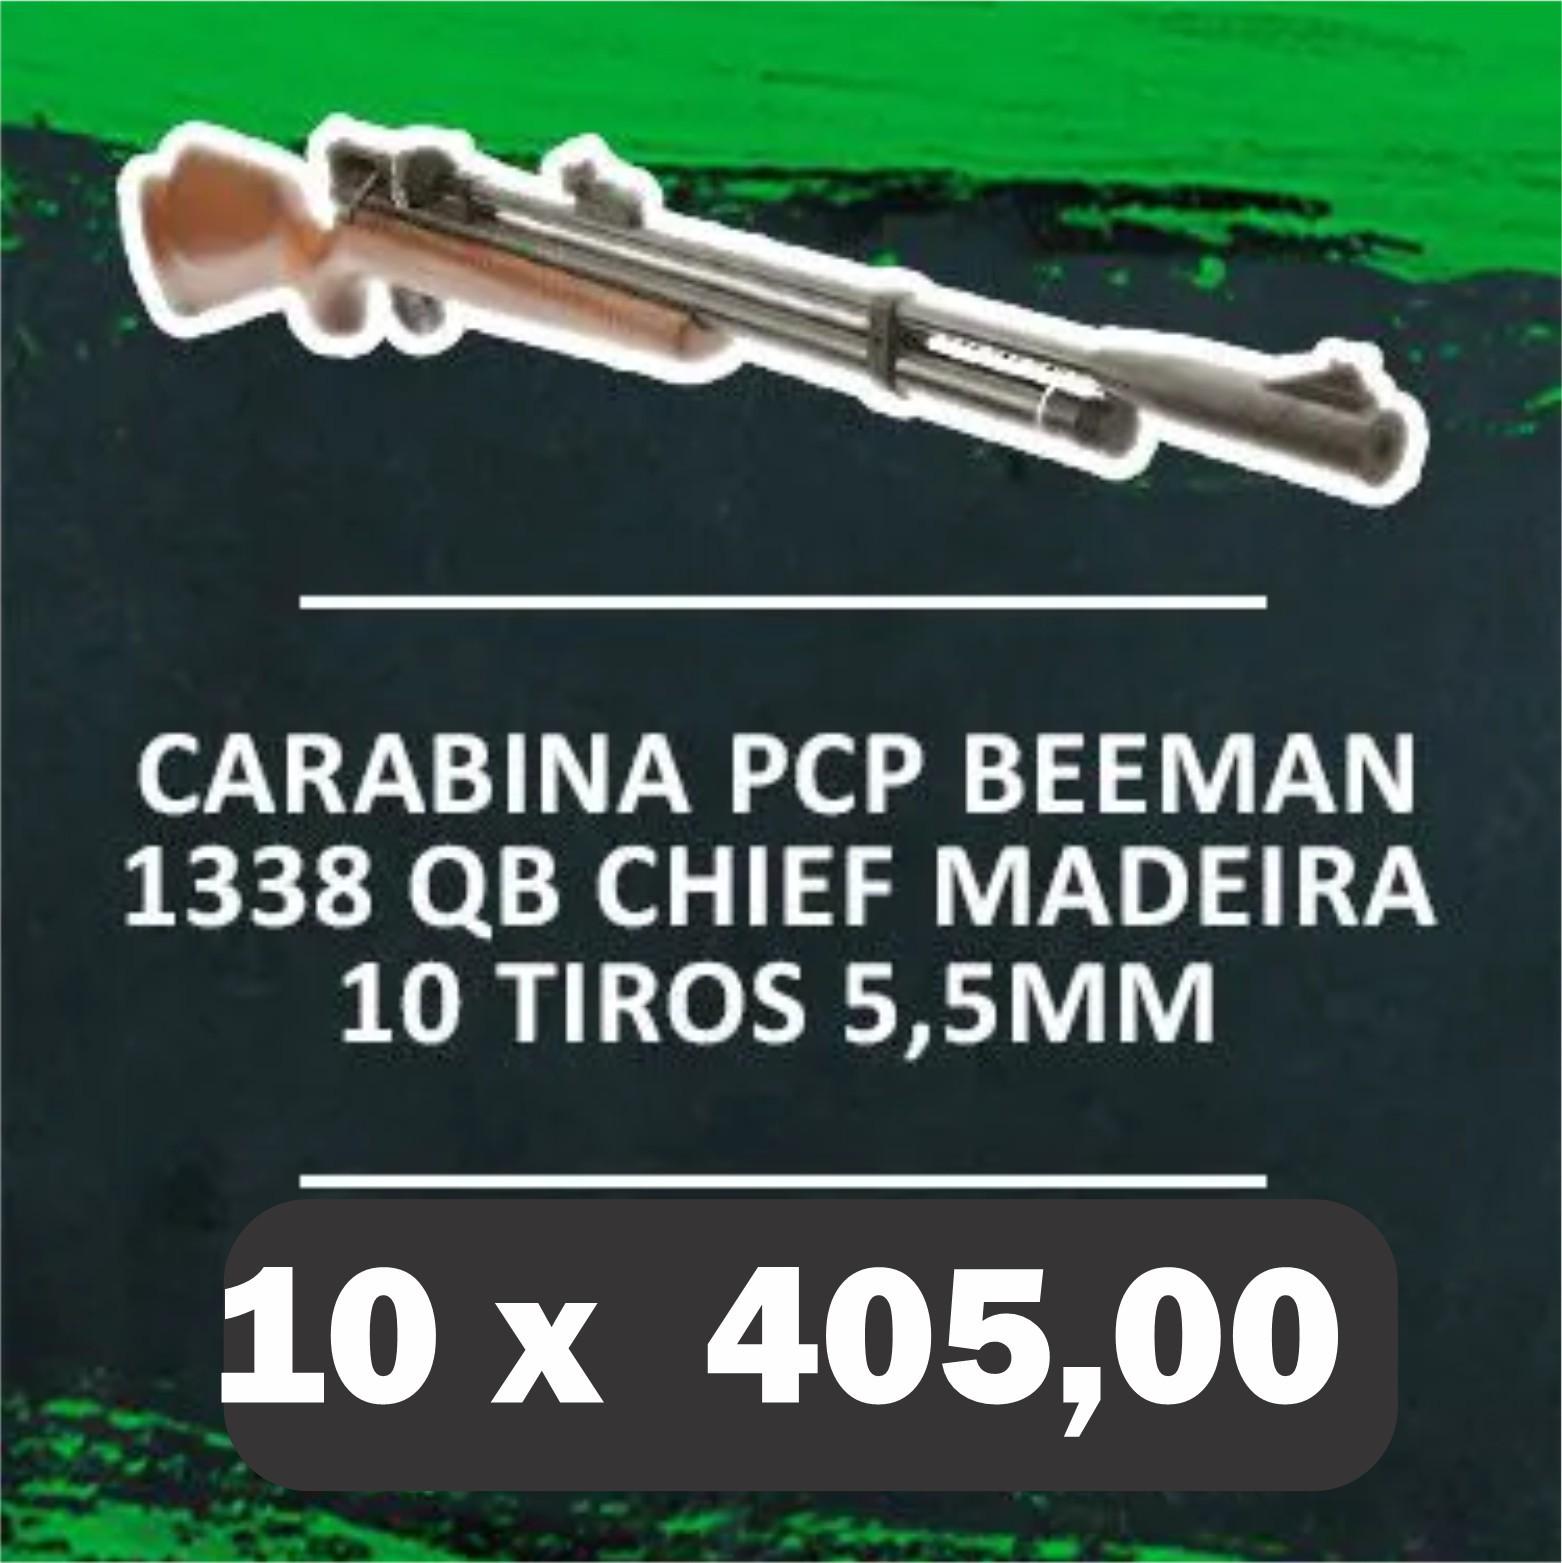 Consórcio - Carabina PCP Beeman 1338 QB II PLUS Chief madeira 10 tiros 5,5mm